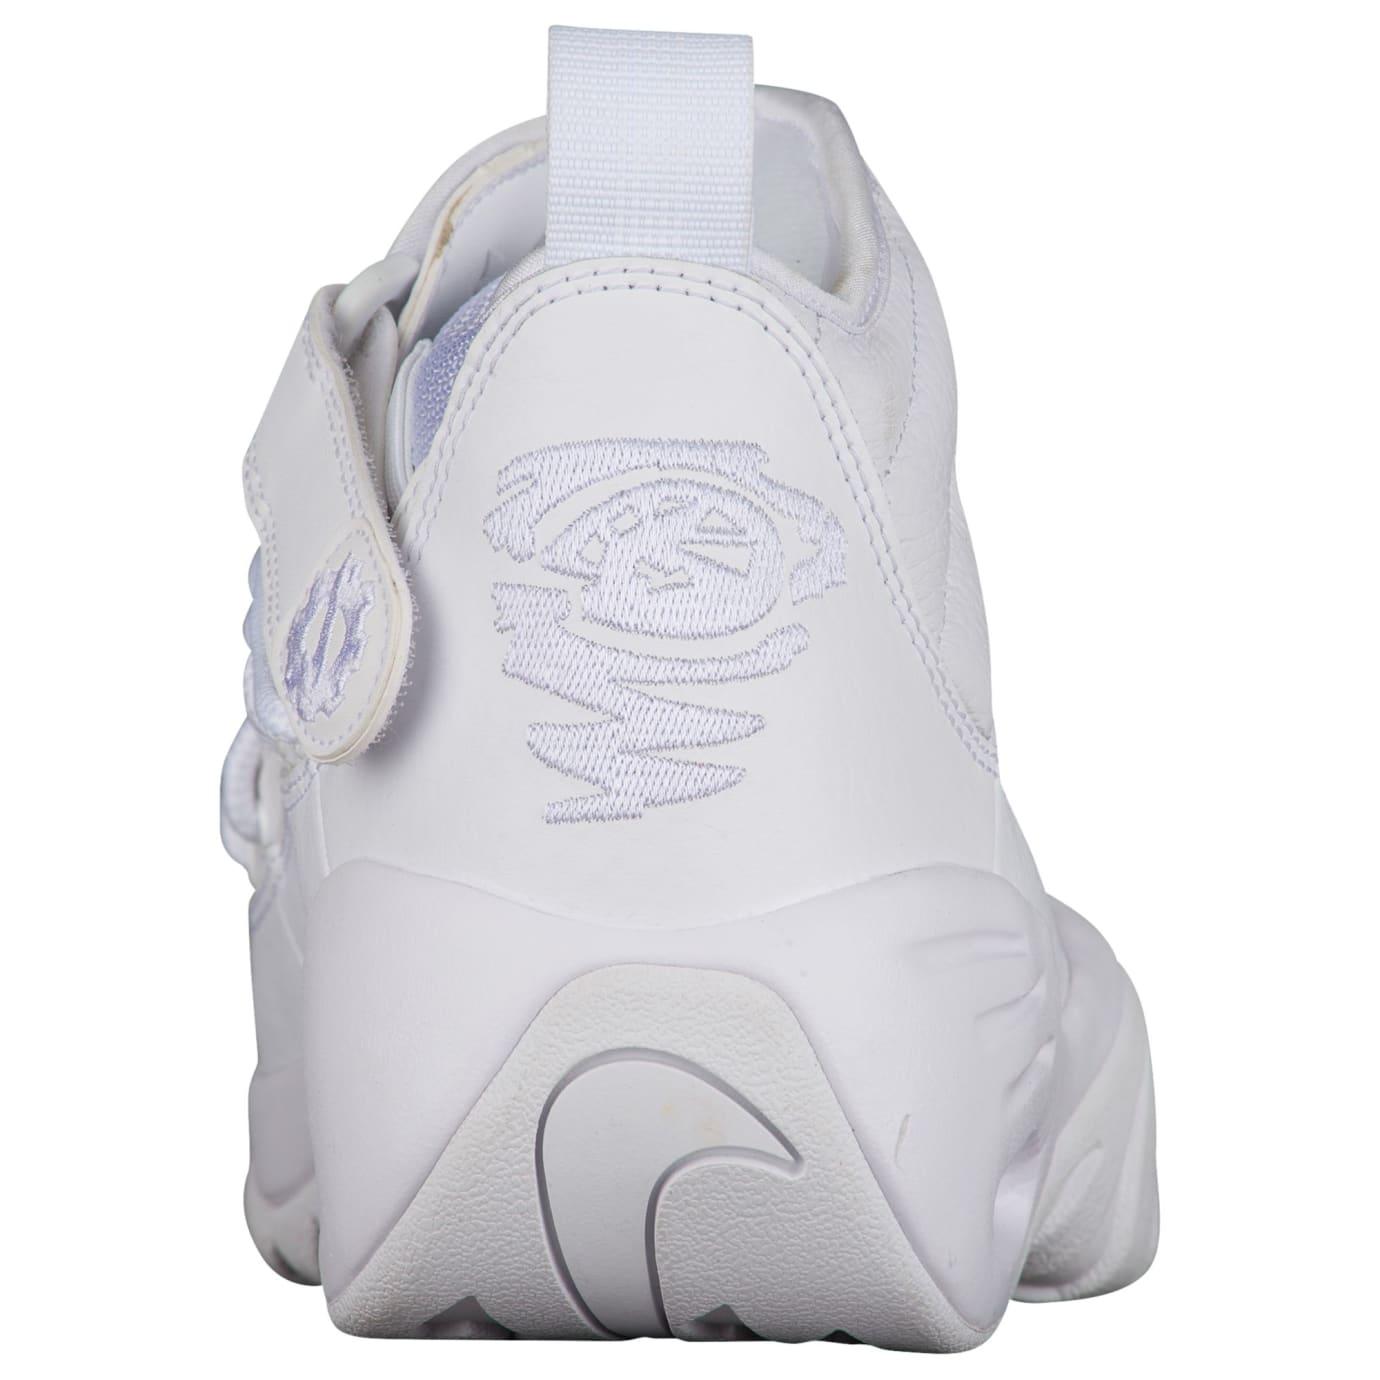 Nike Air Shake Ndestrukt All-White Release Date Heel 880869-101